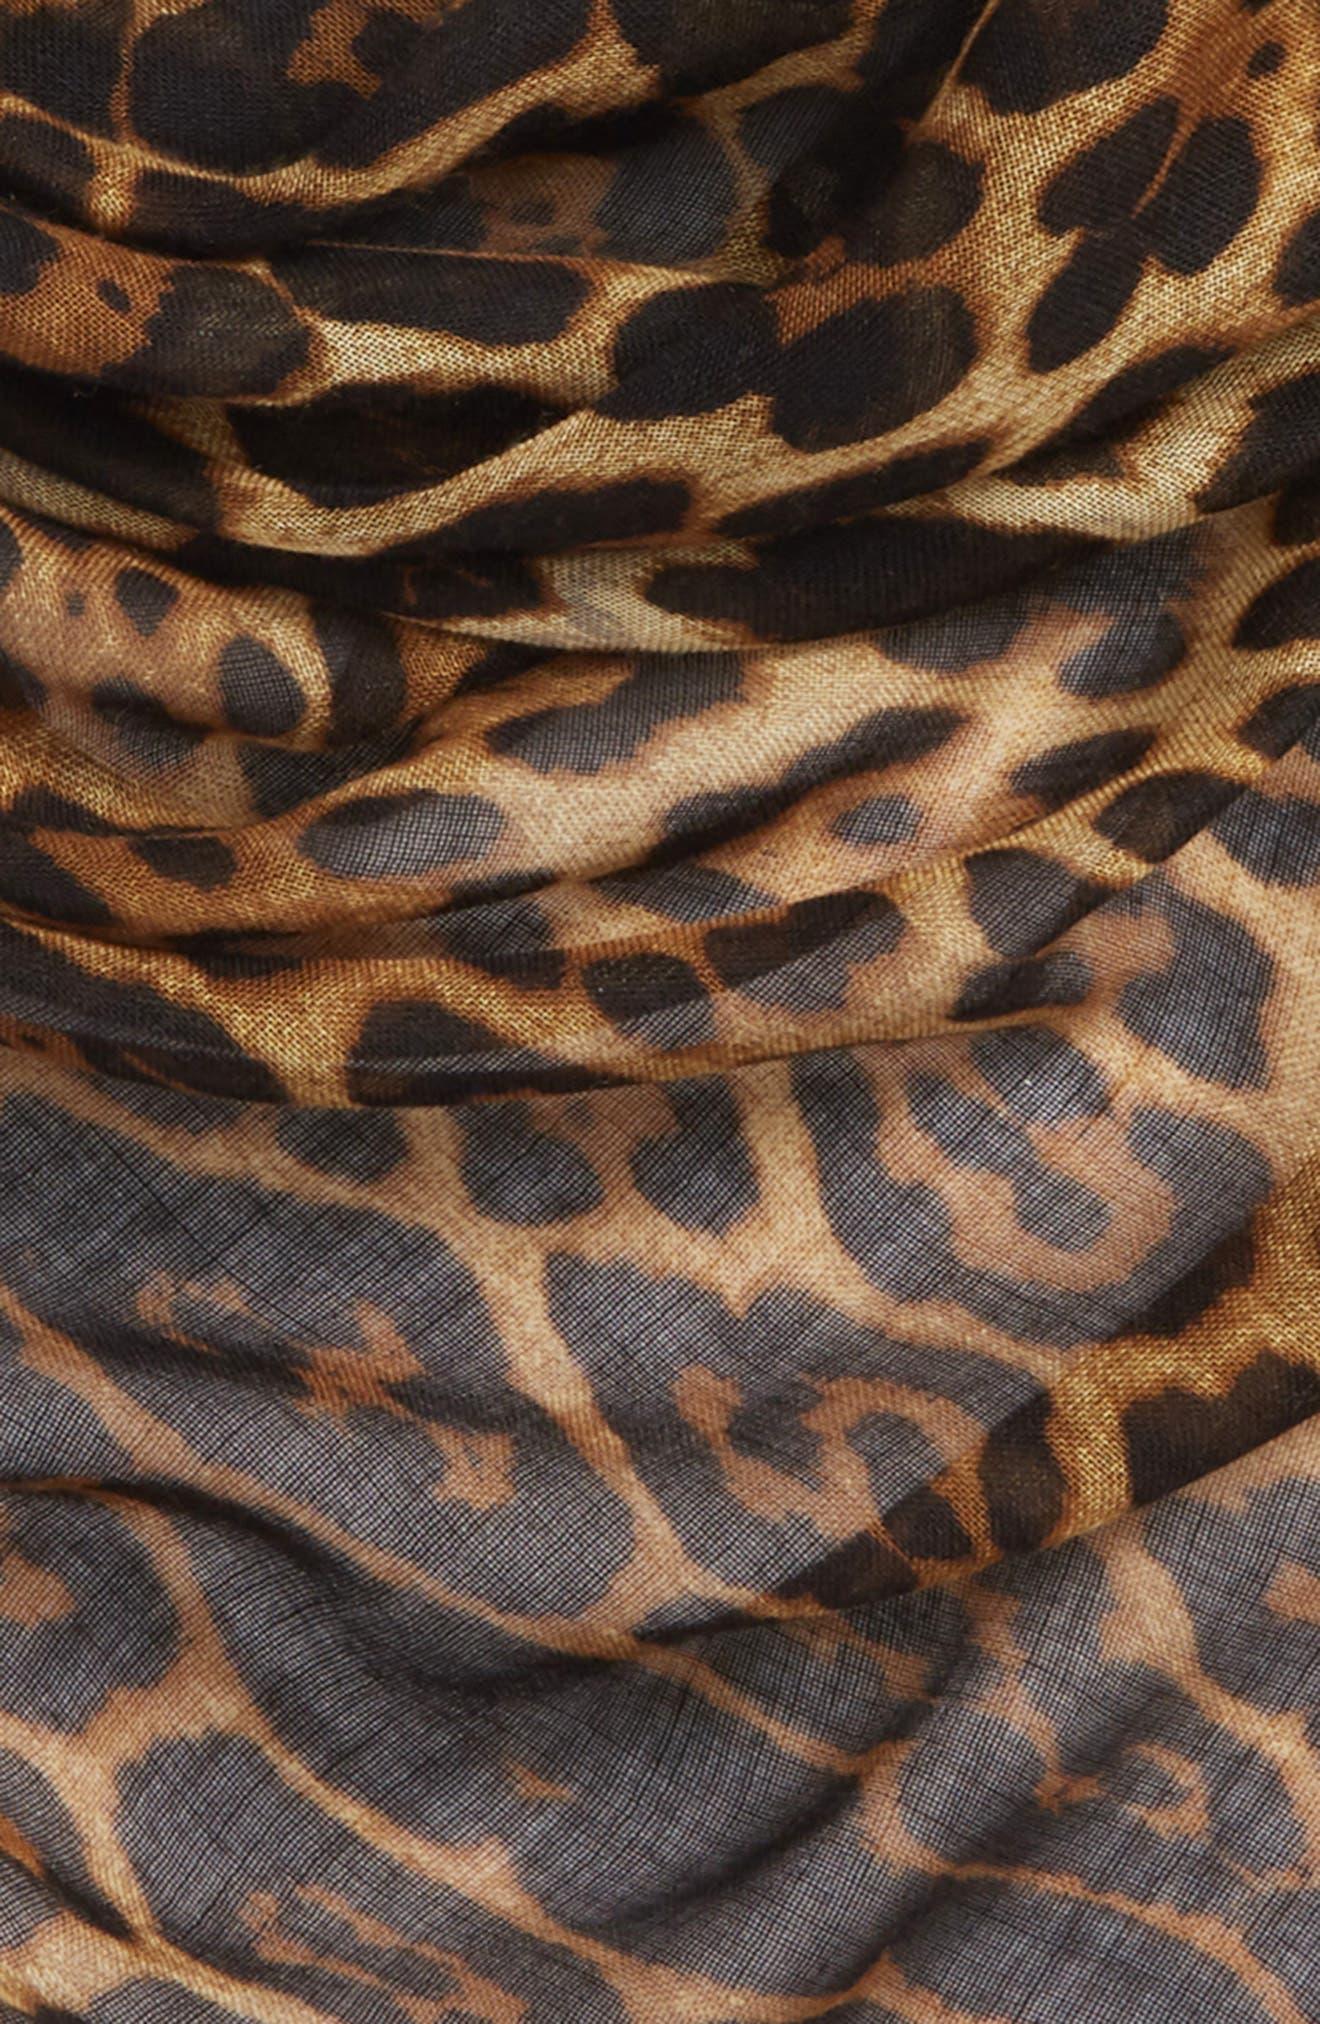 YSL Leopard Print Cashmere & Silk Triangle Scarf,                             Alternate thumbnail 3, color,                             001